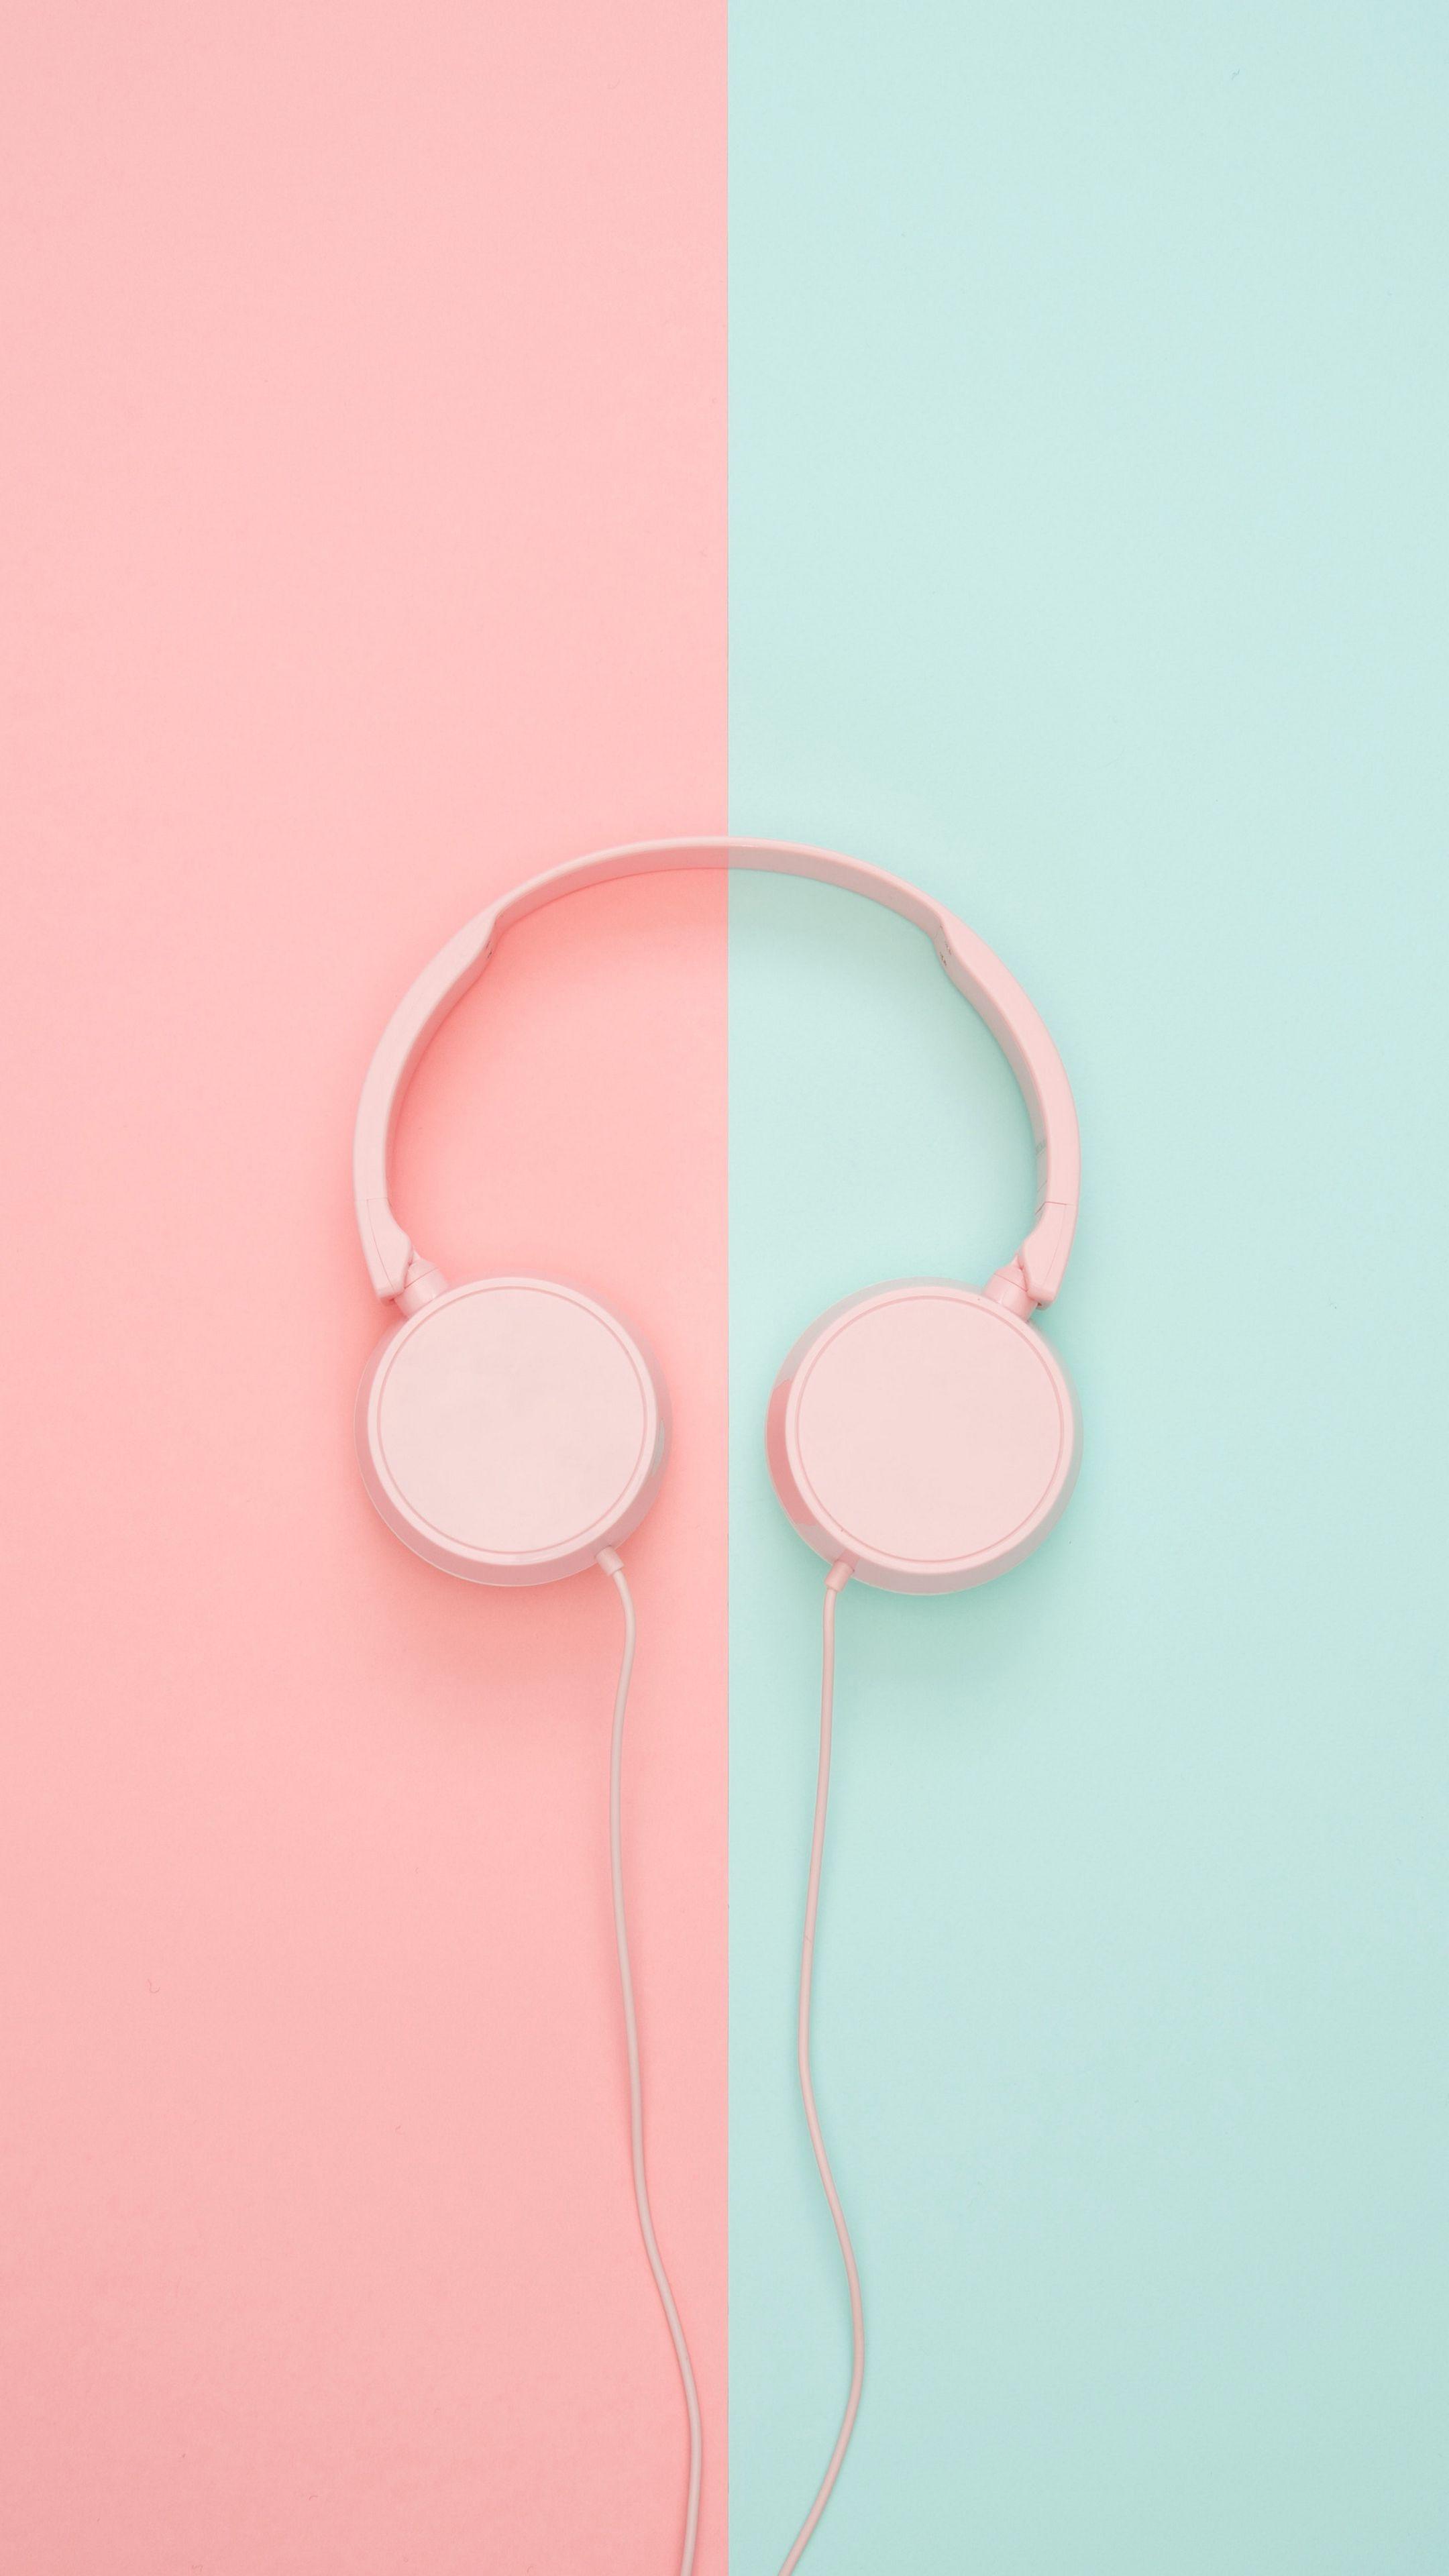 2160x3840 Wallpaper headphones, minimalism, pink, pastel